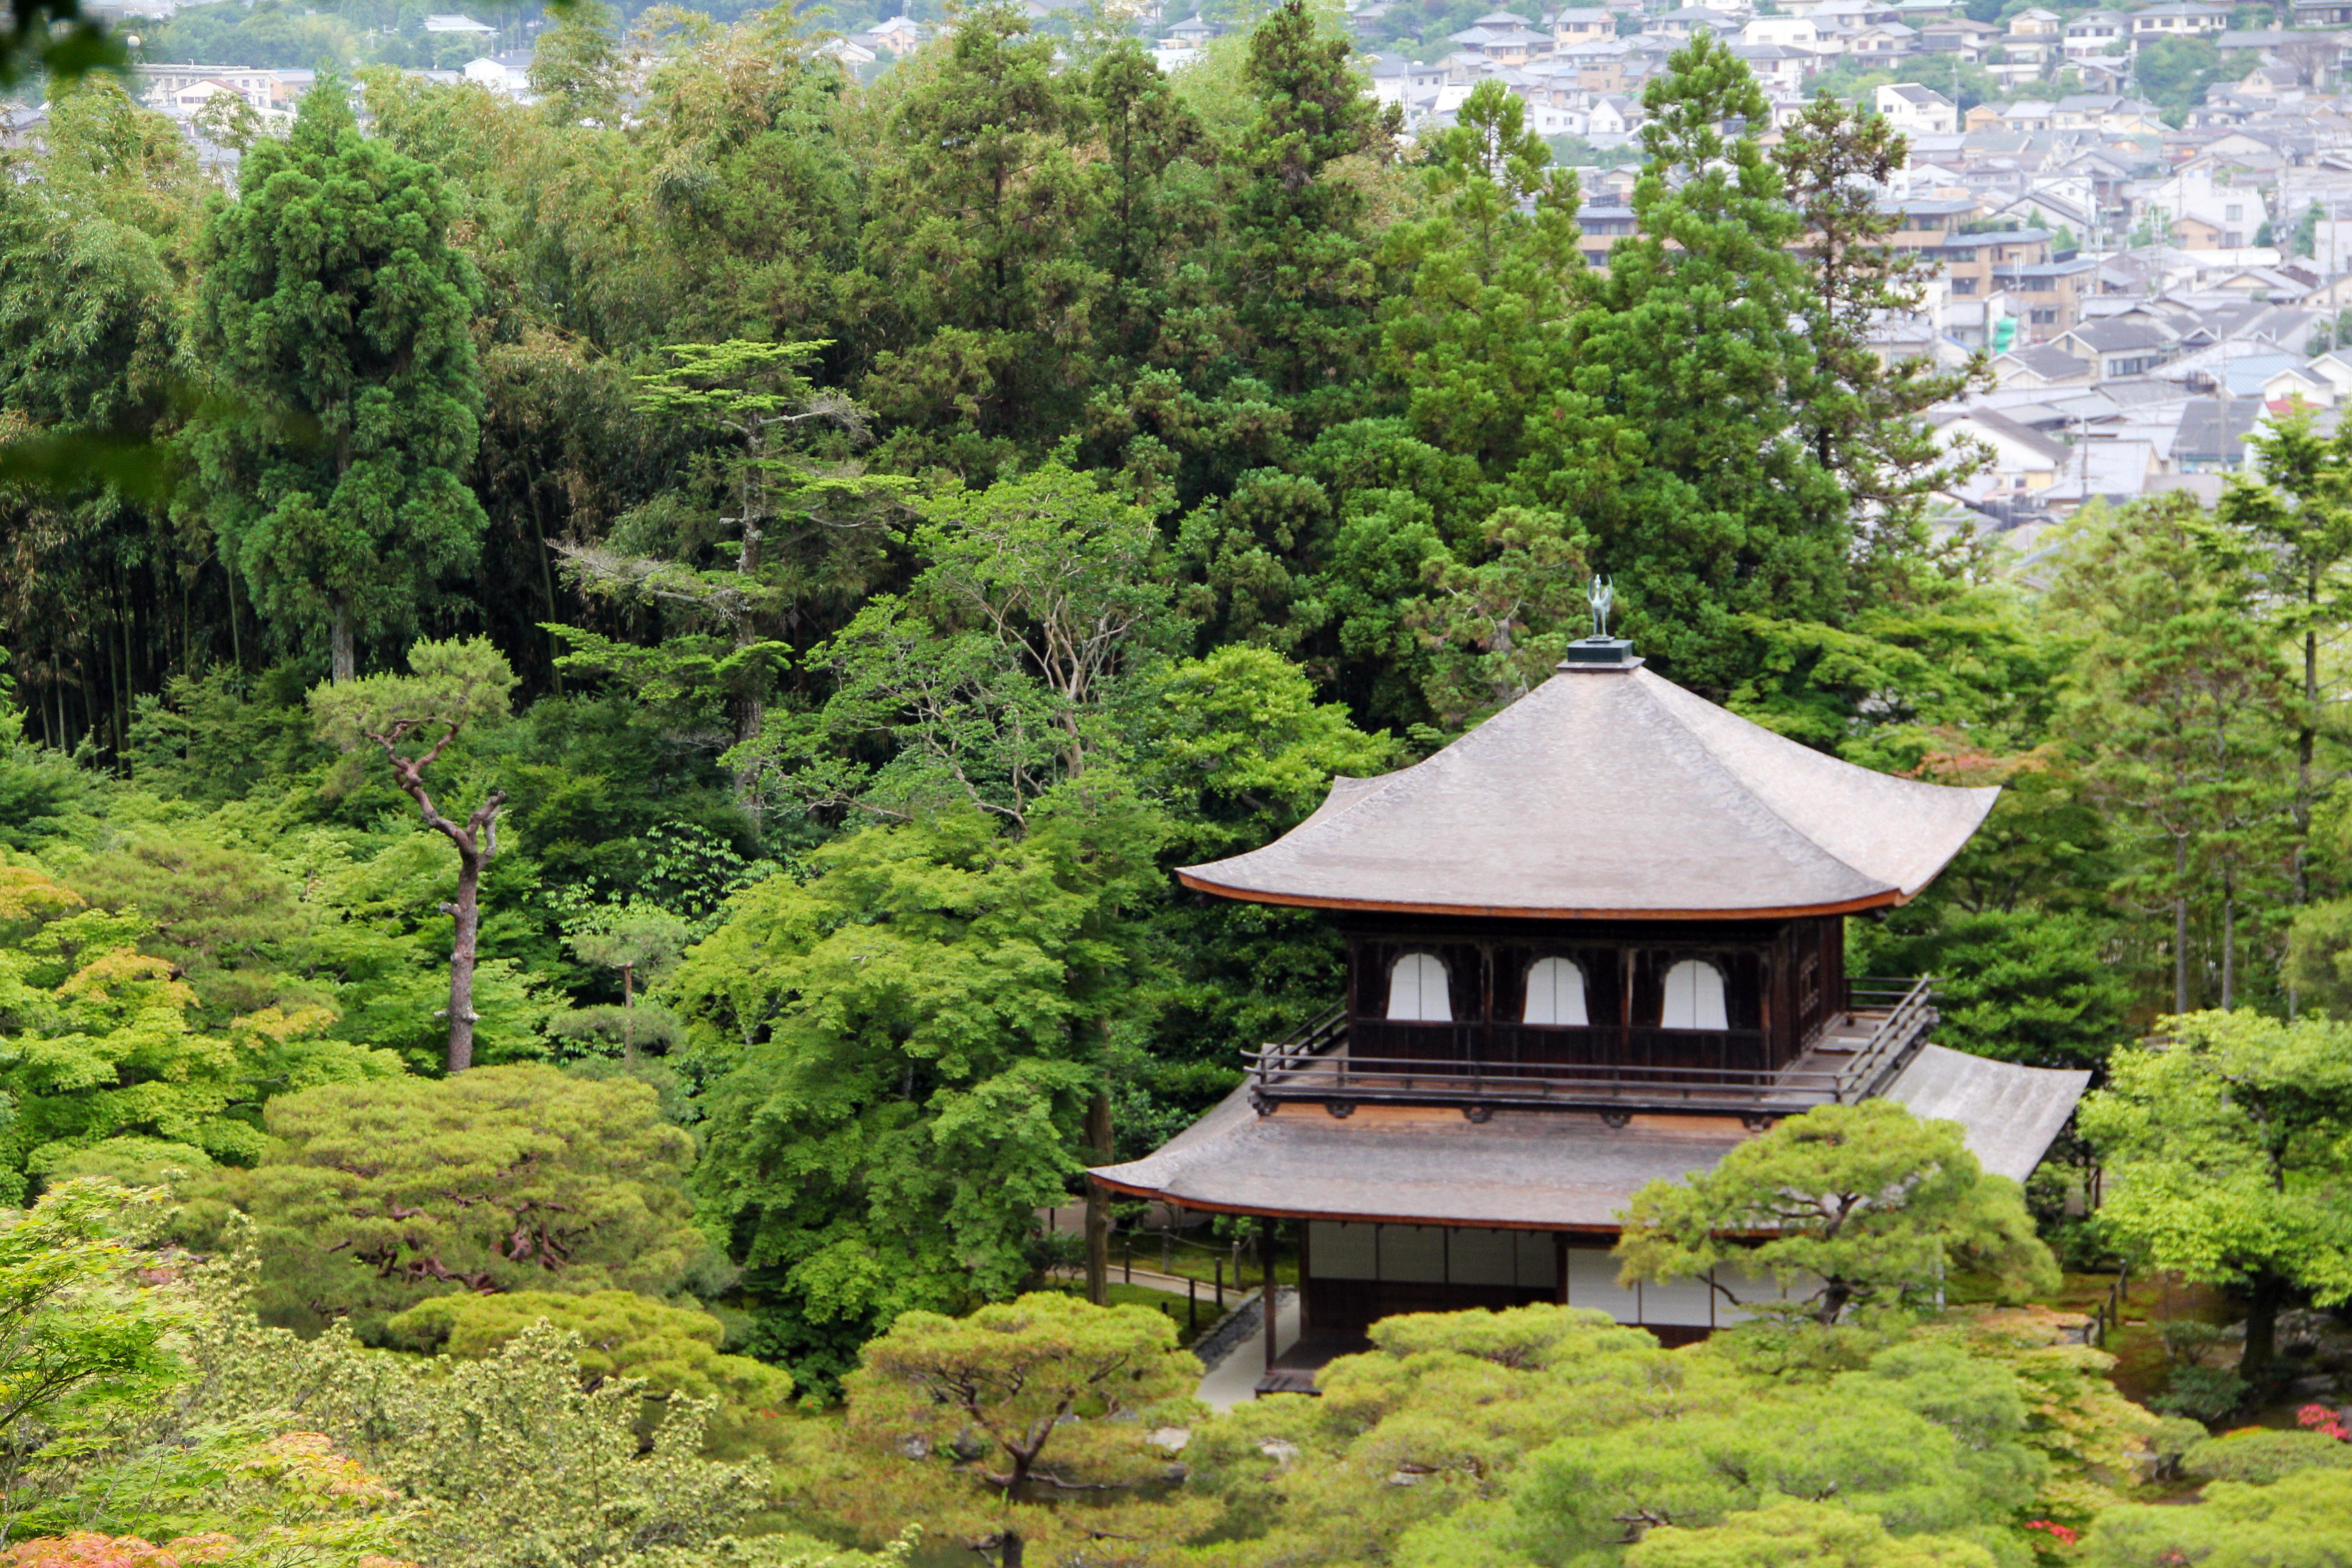 Ginkaku, the Silver Pavilion